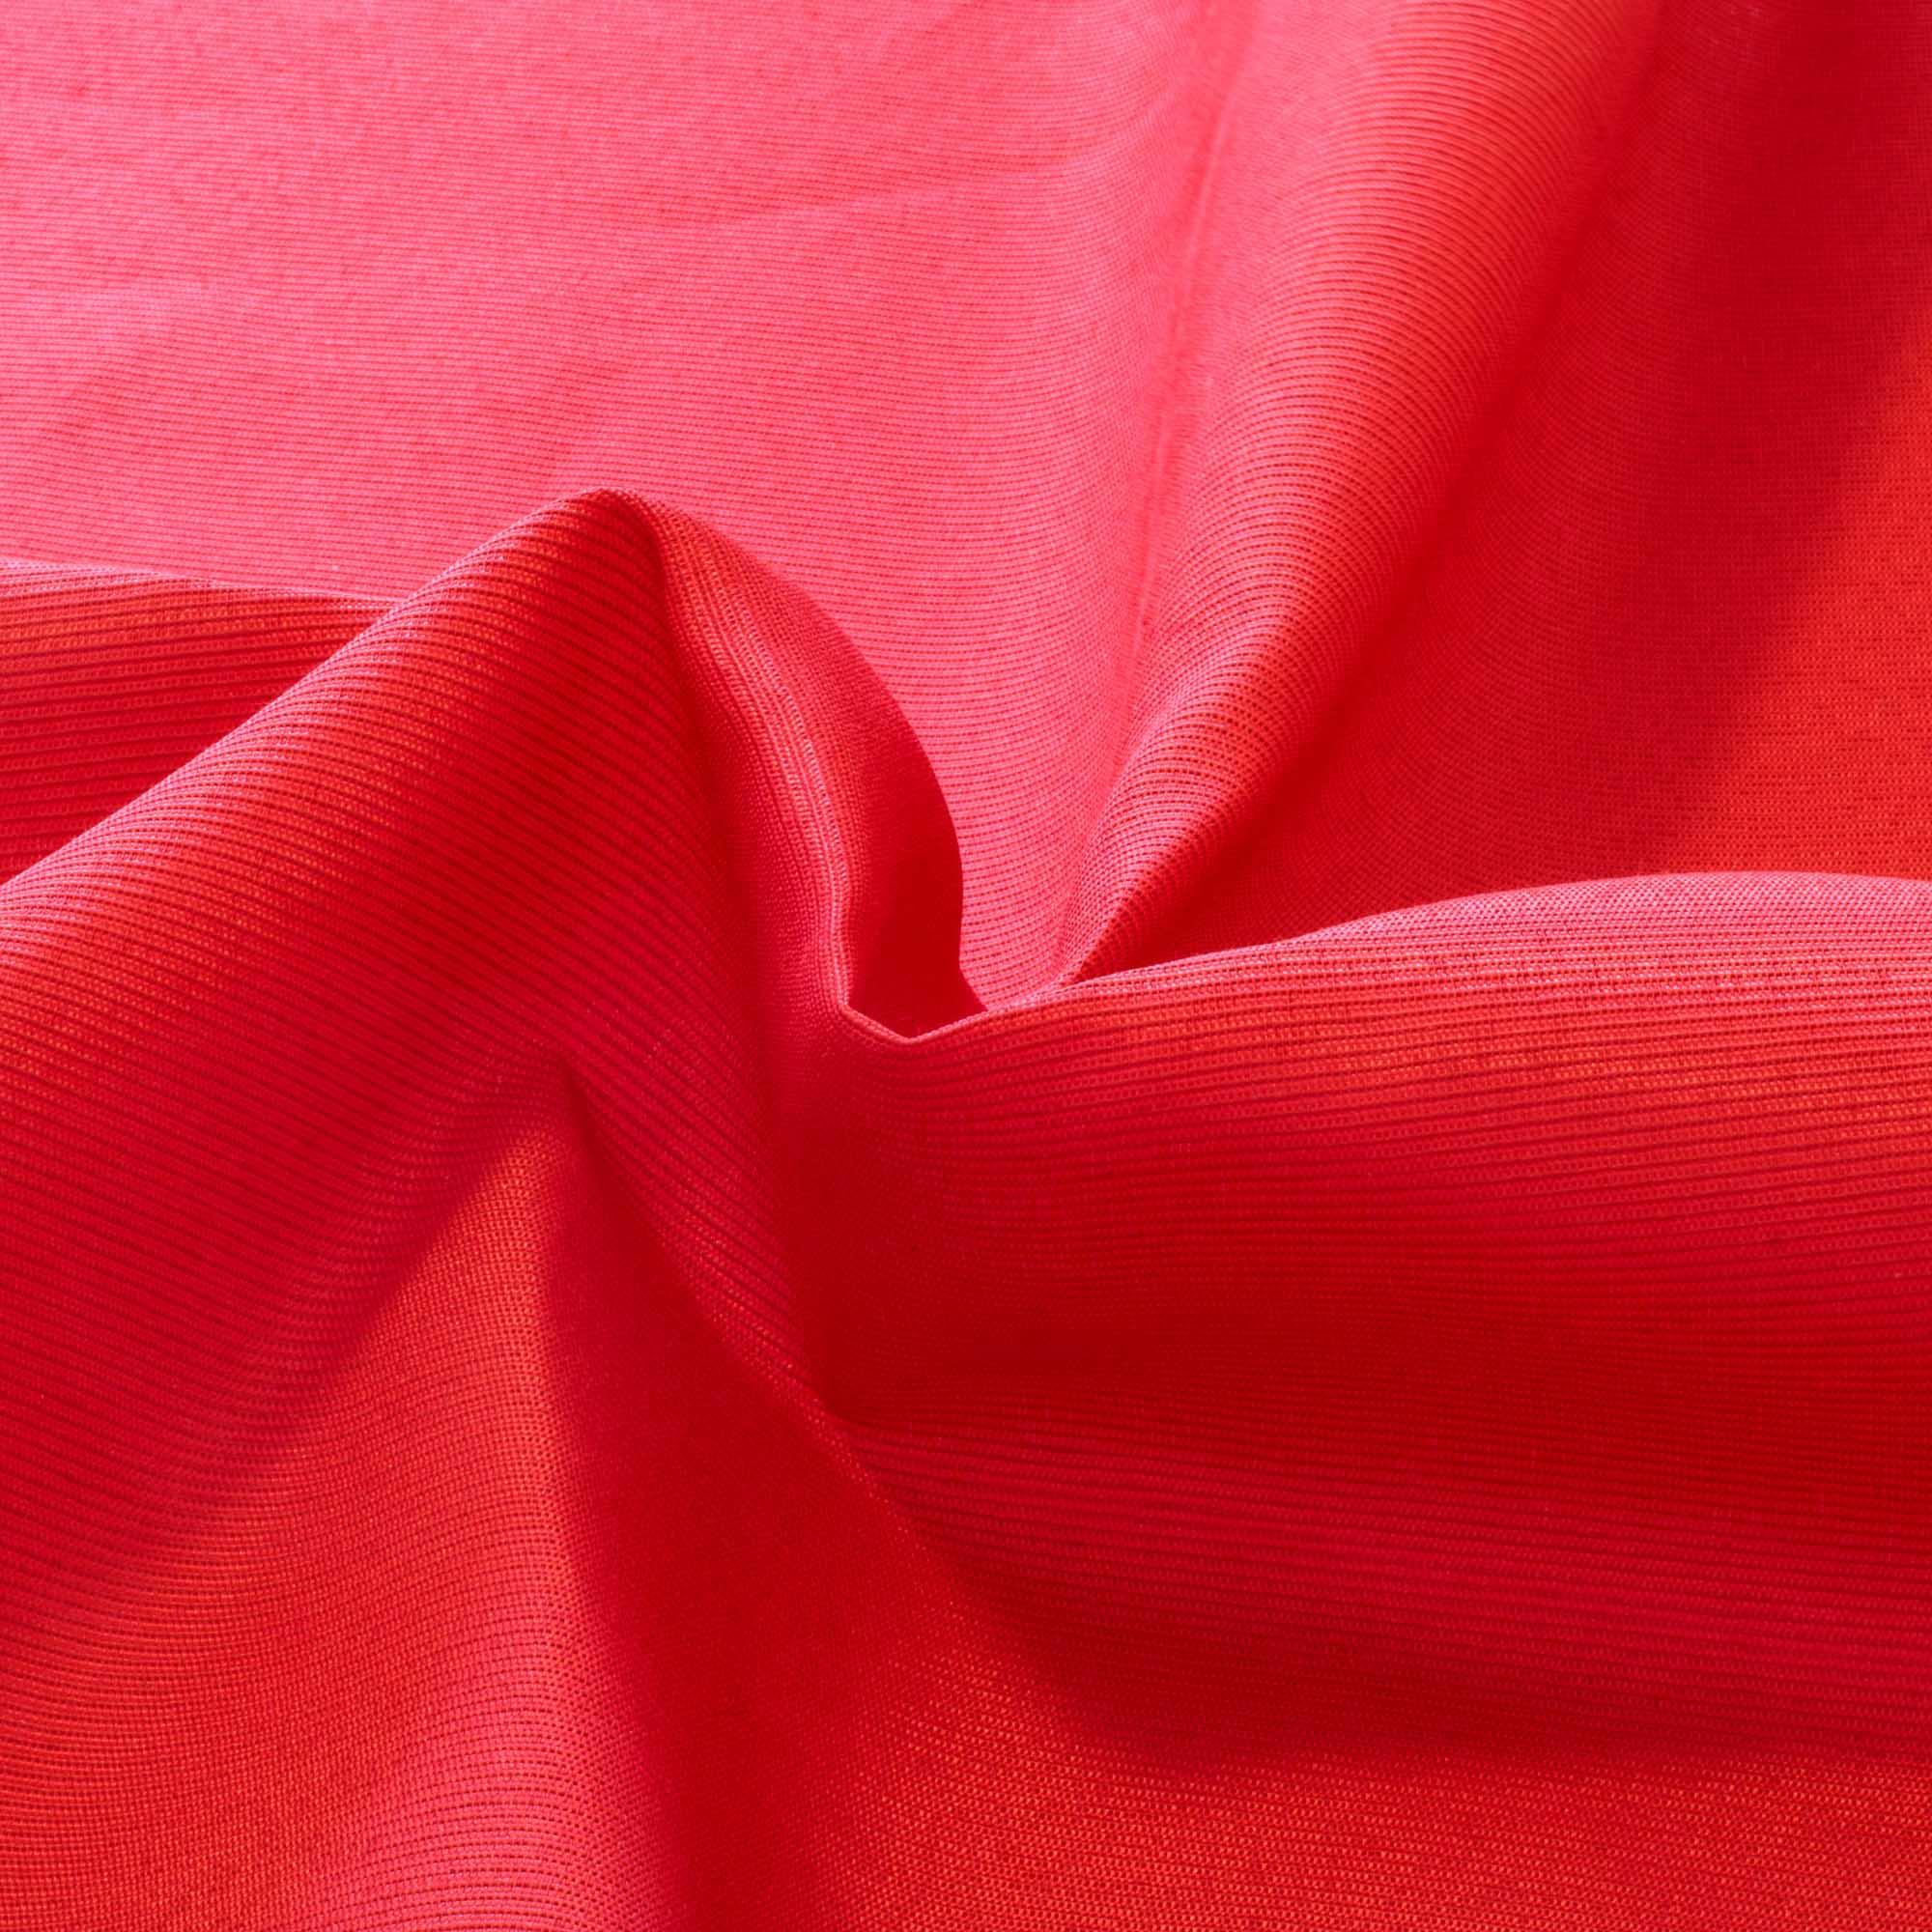 Tecido Gorgurinho Liso 1,50 Mt Largura Vermelho Marslla